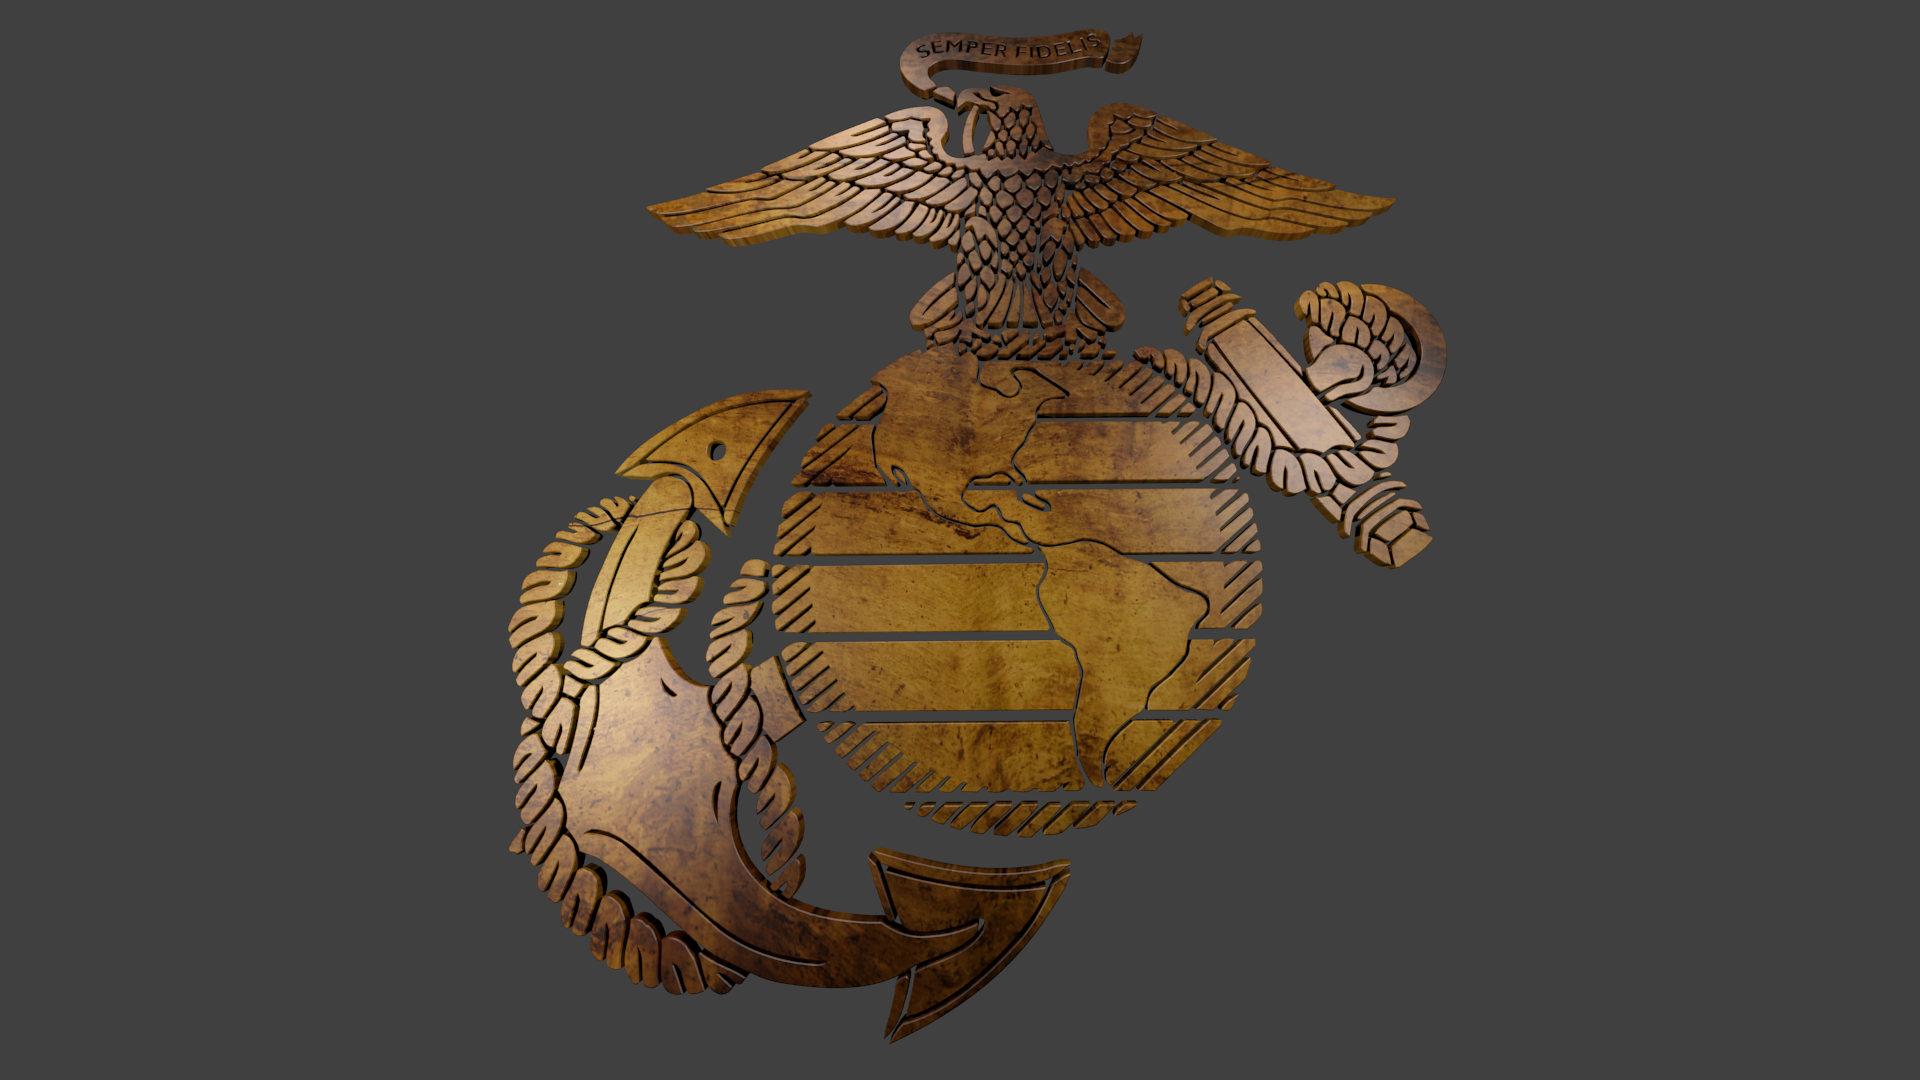 marines usmc military r wallpaper | 1920x1080 | 46655 | wallpaperup